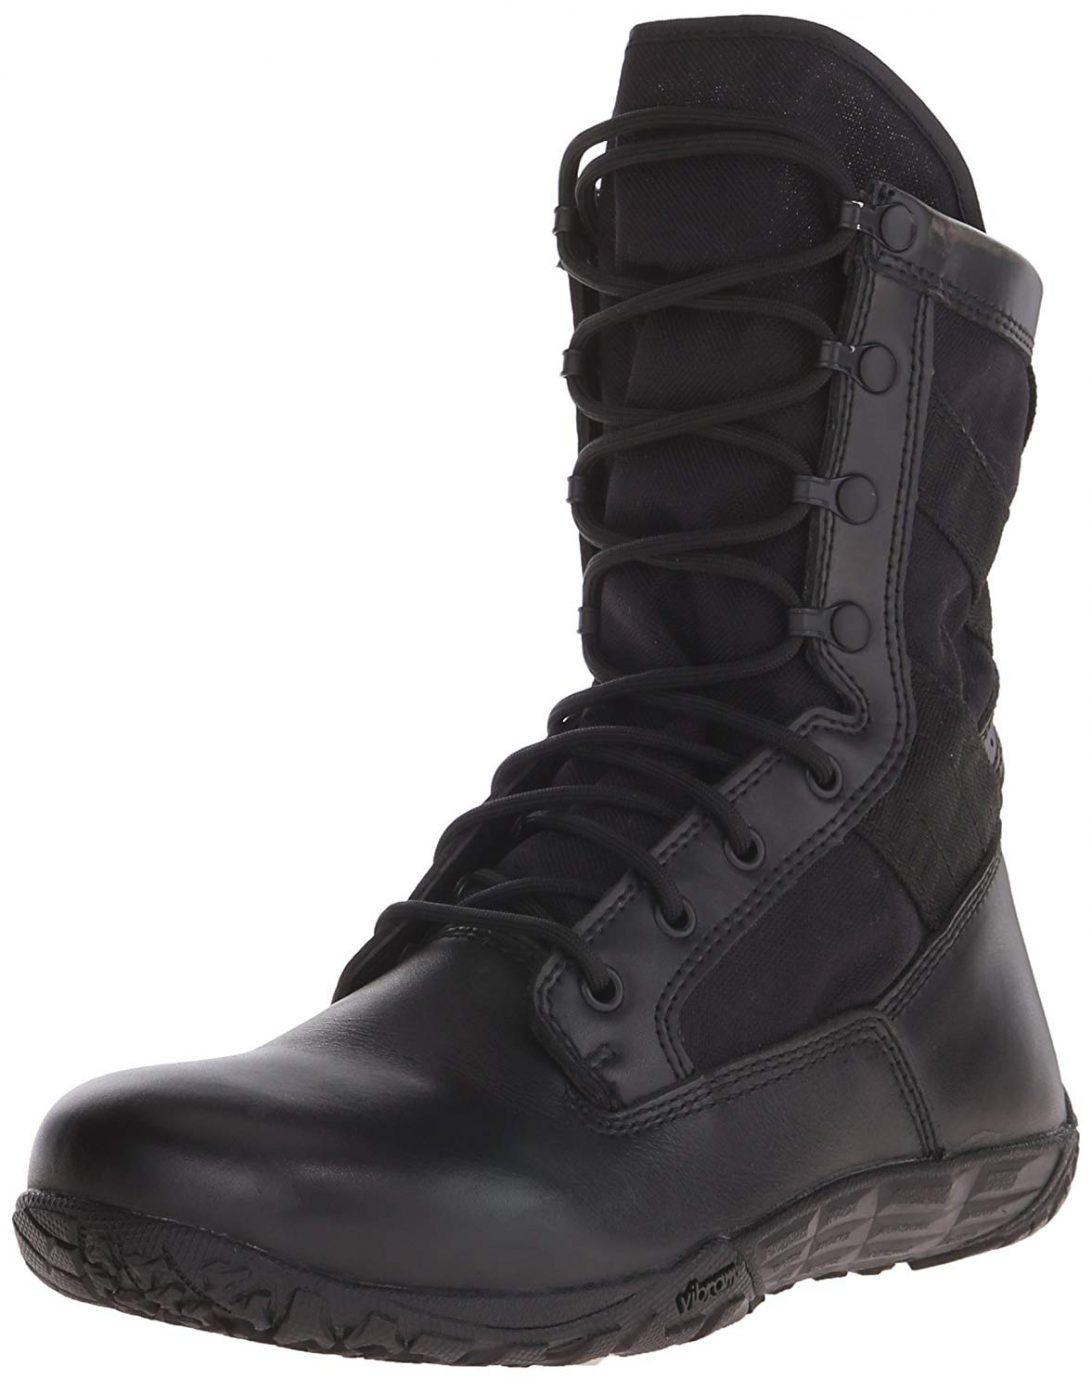 Fashionable Steel Toe Boots Reddit in